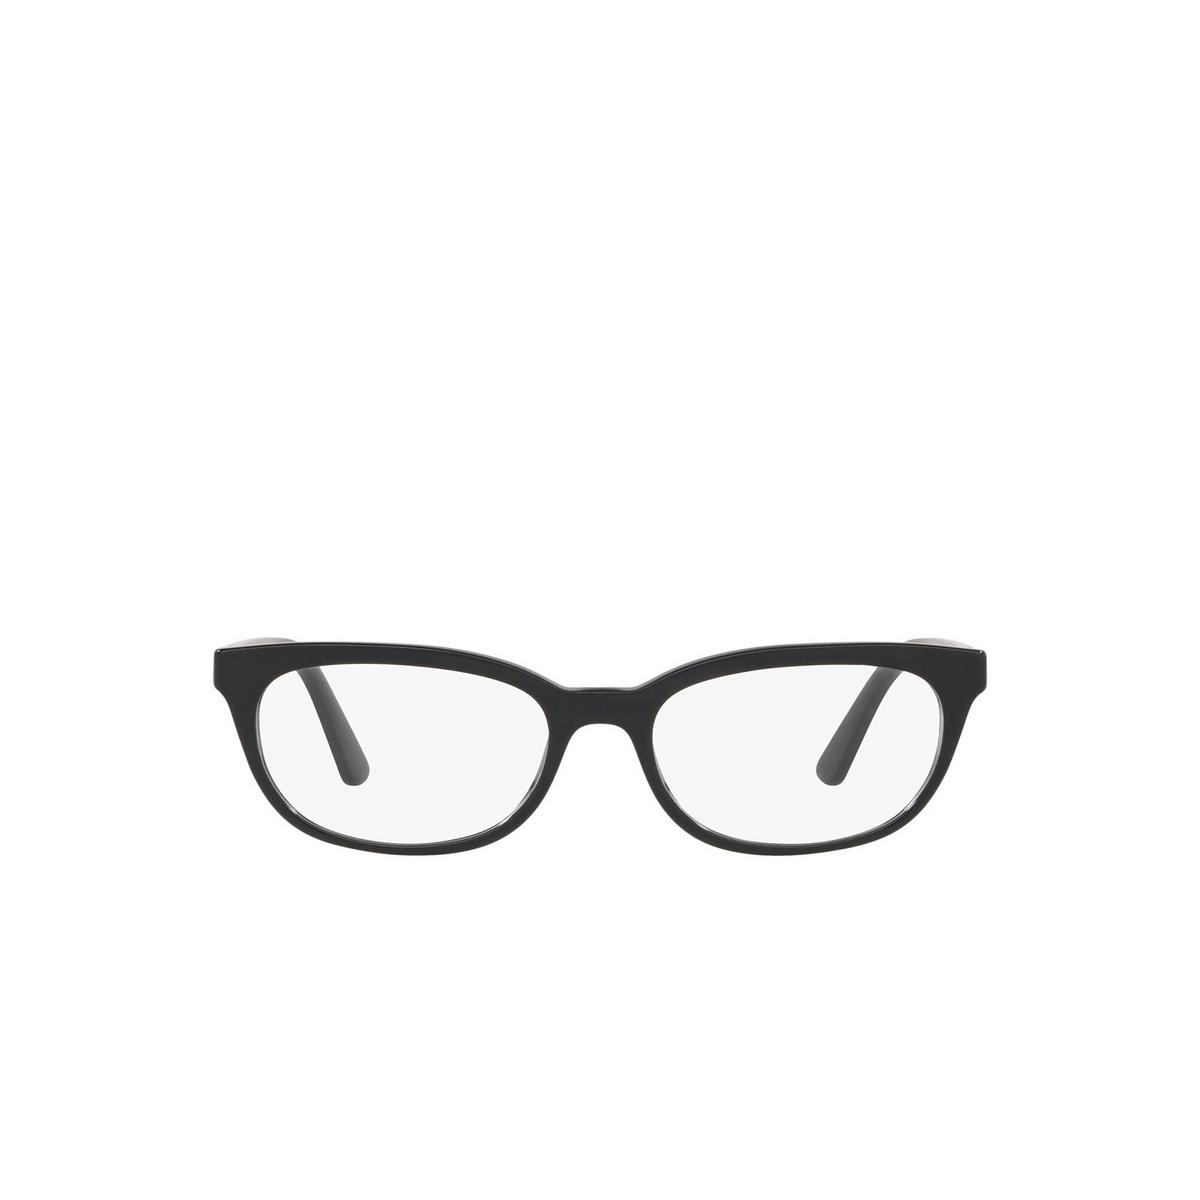 Prada® Oval Eyeglasses: Catwalk PR 13VV color Black 1AB1O1 - front view.